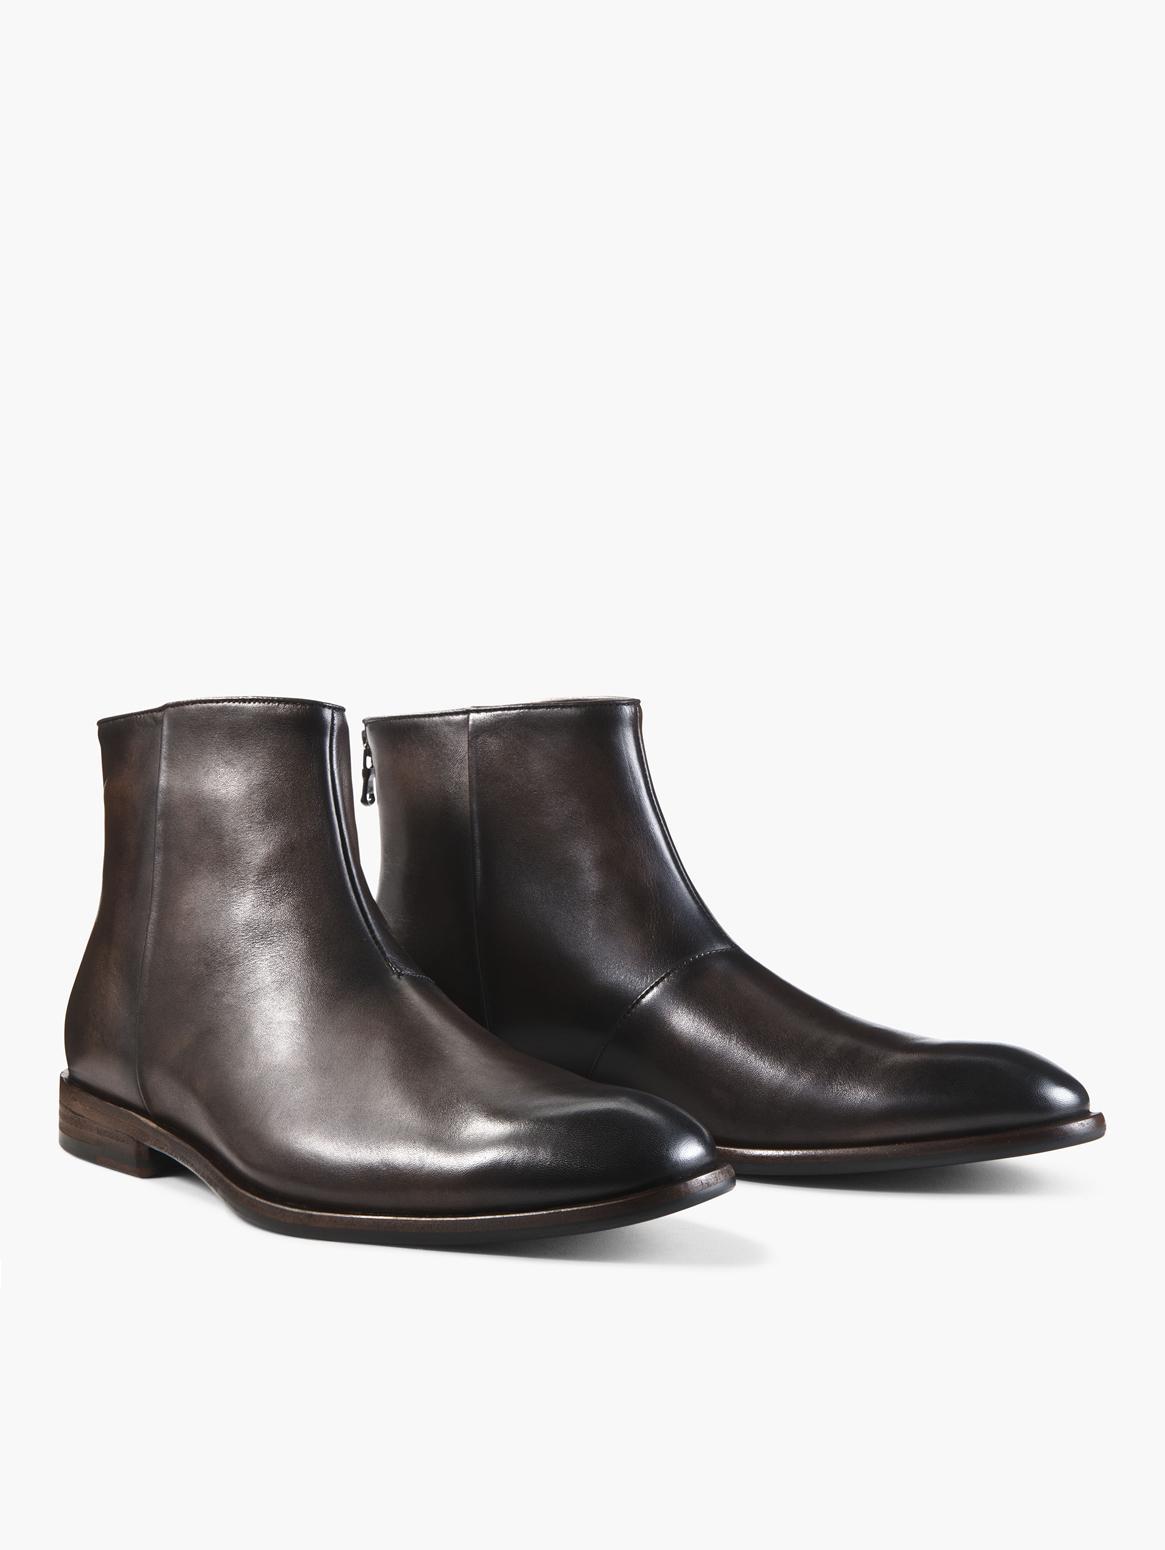 John Varvatos Nyc Back Zip Boots Wood Brown